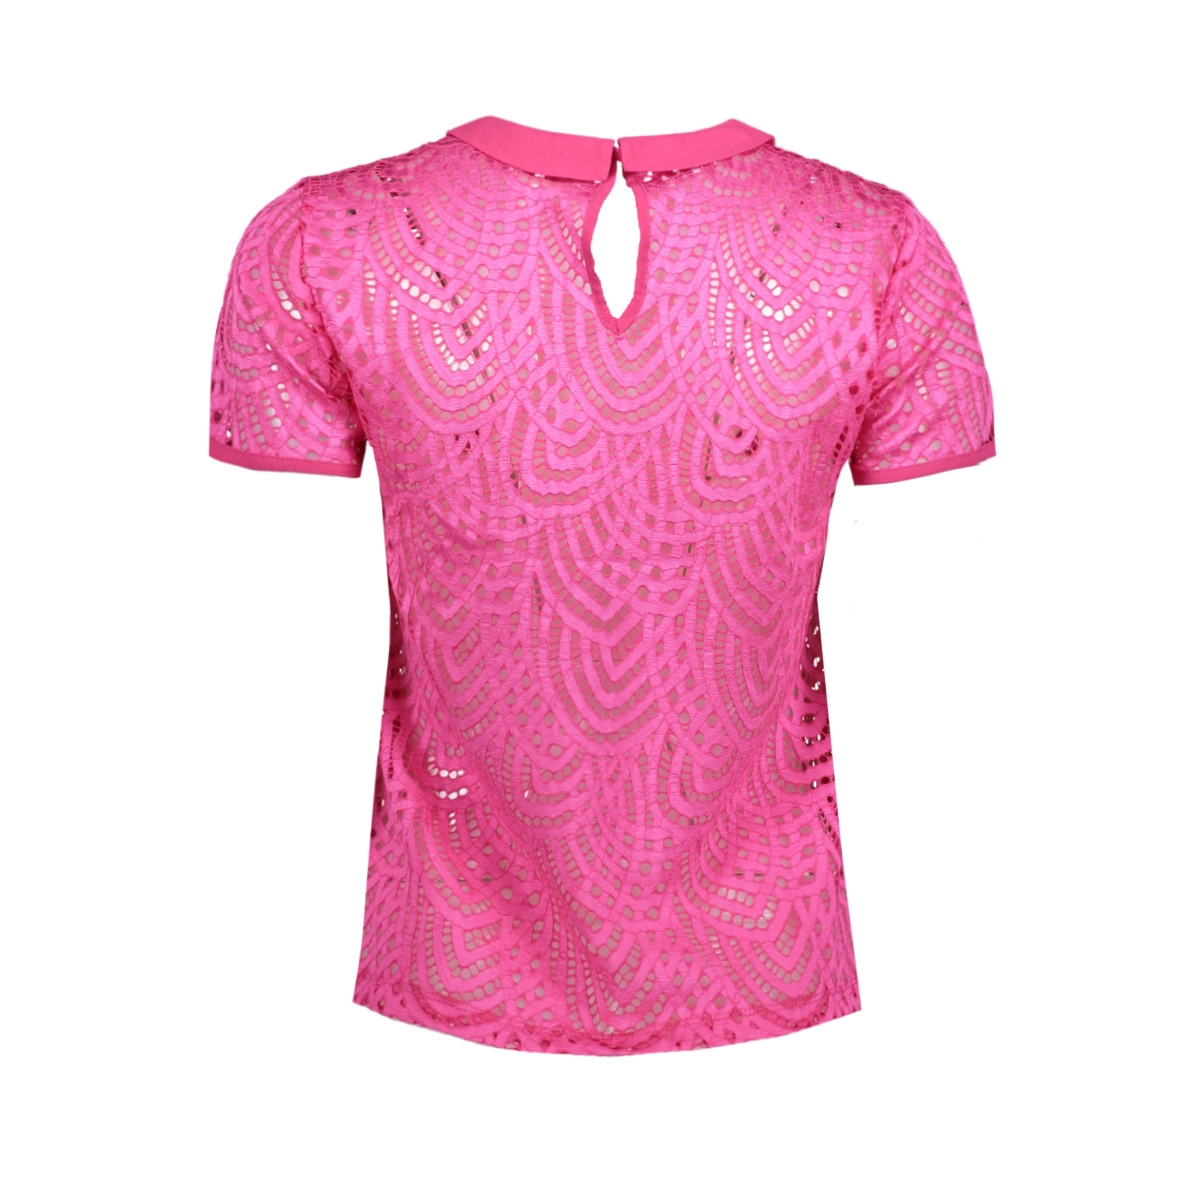 onldutch s/s lace top jrs 15150480 only t-shirt fuchsia purple